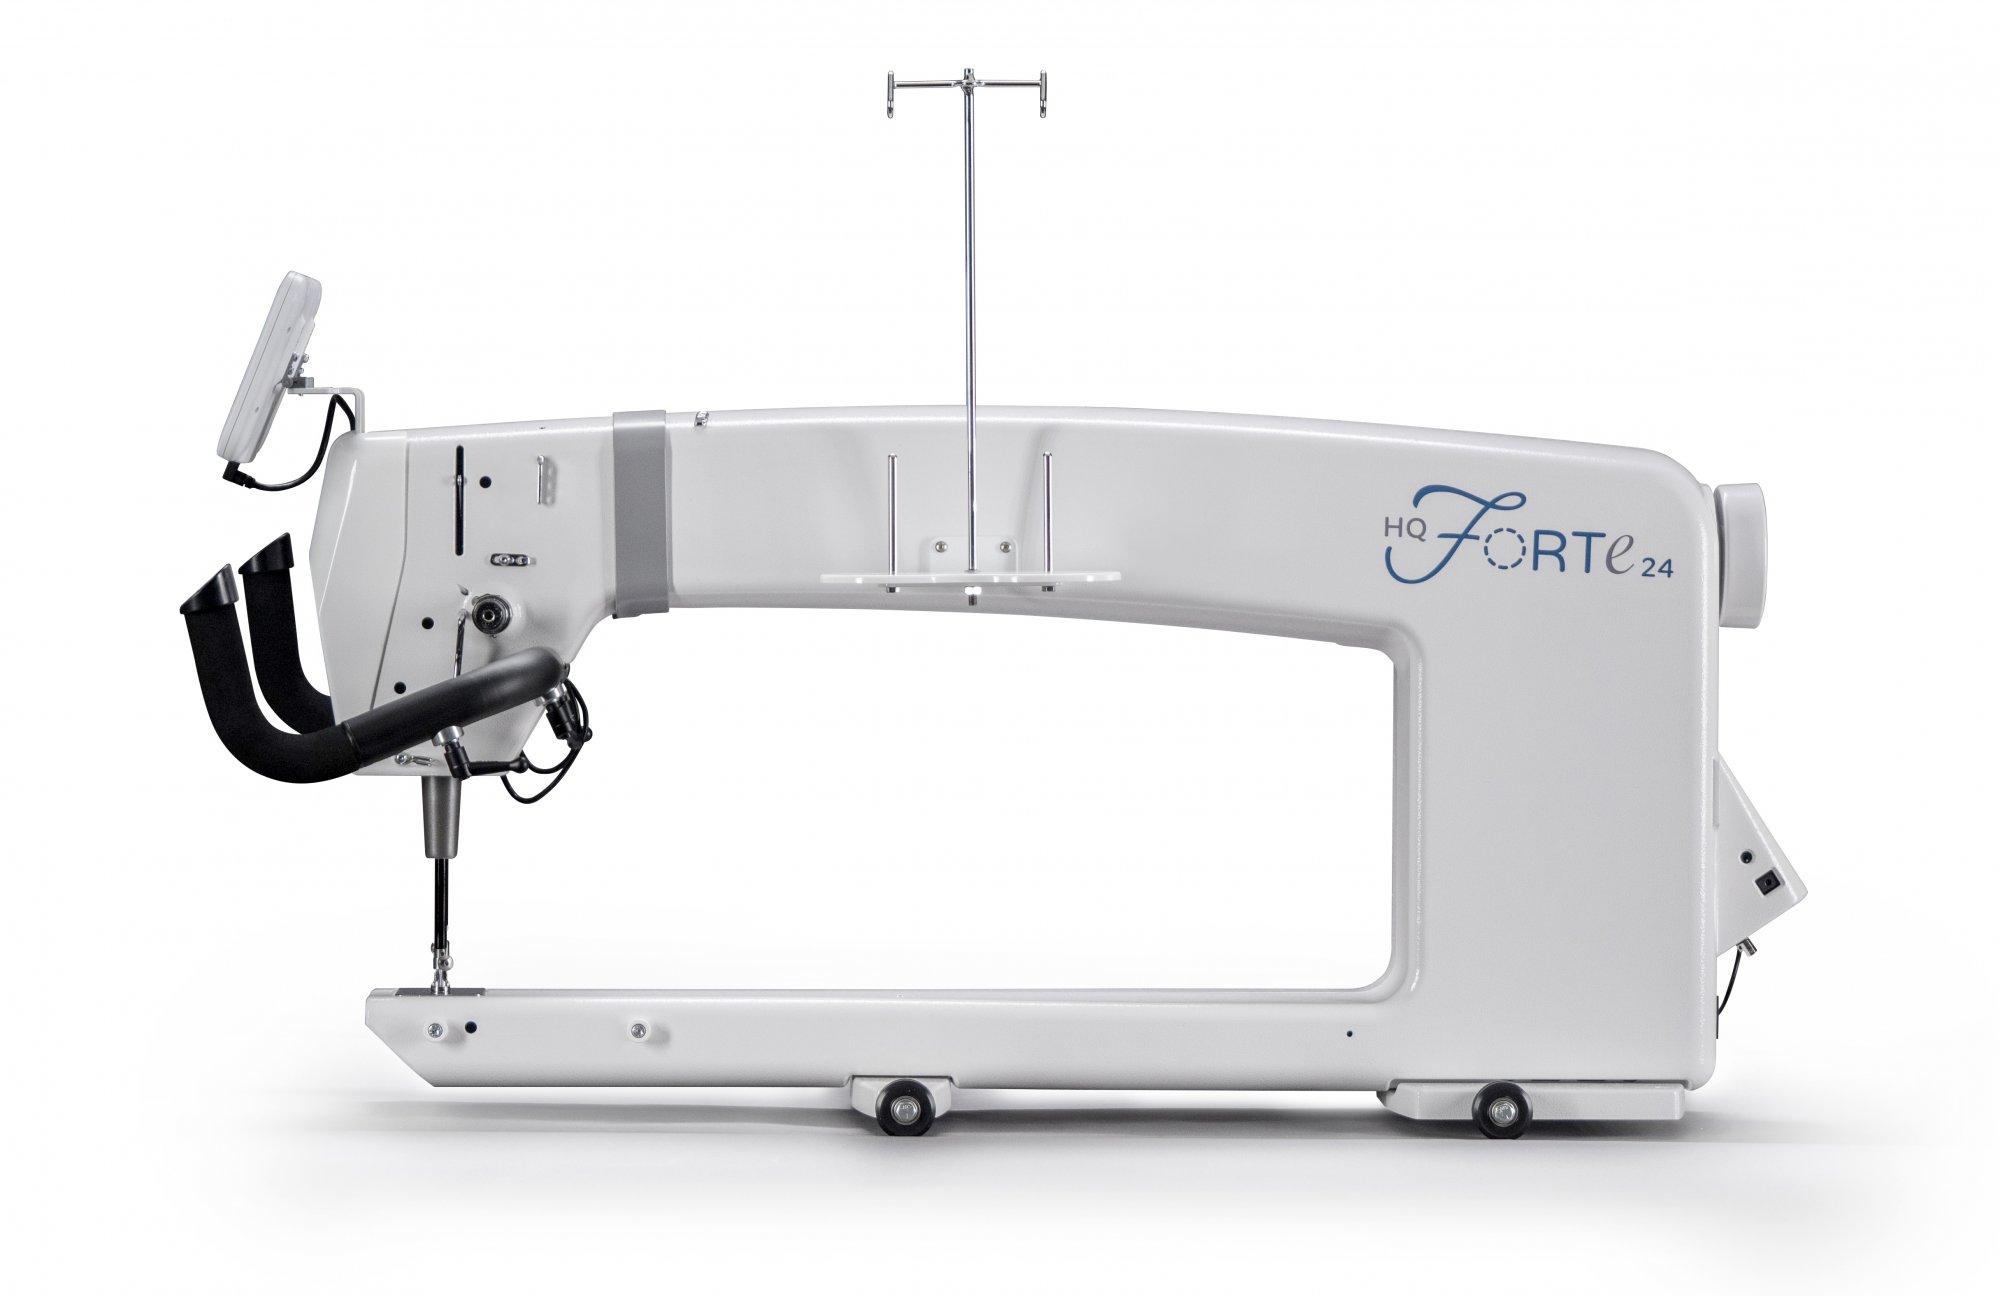 HQ Forte 24-inch Longarm Quilting Machine